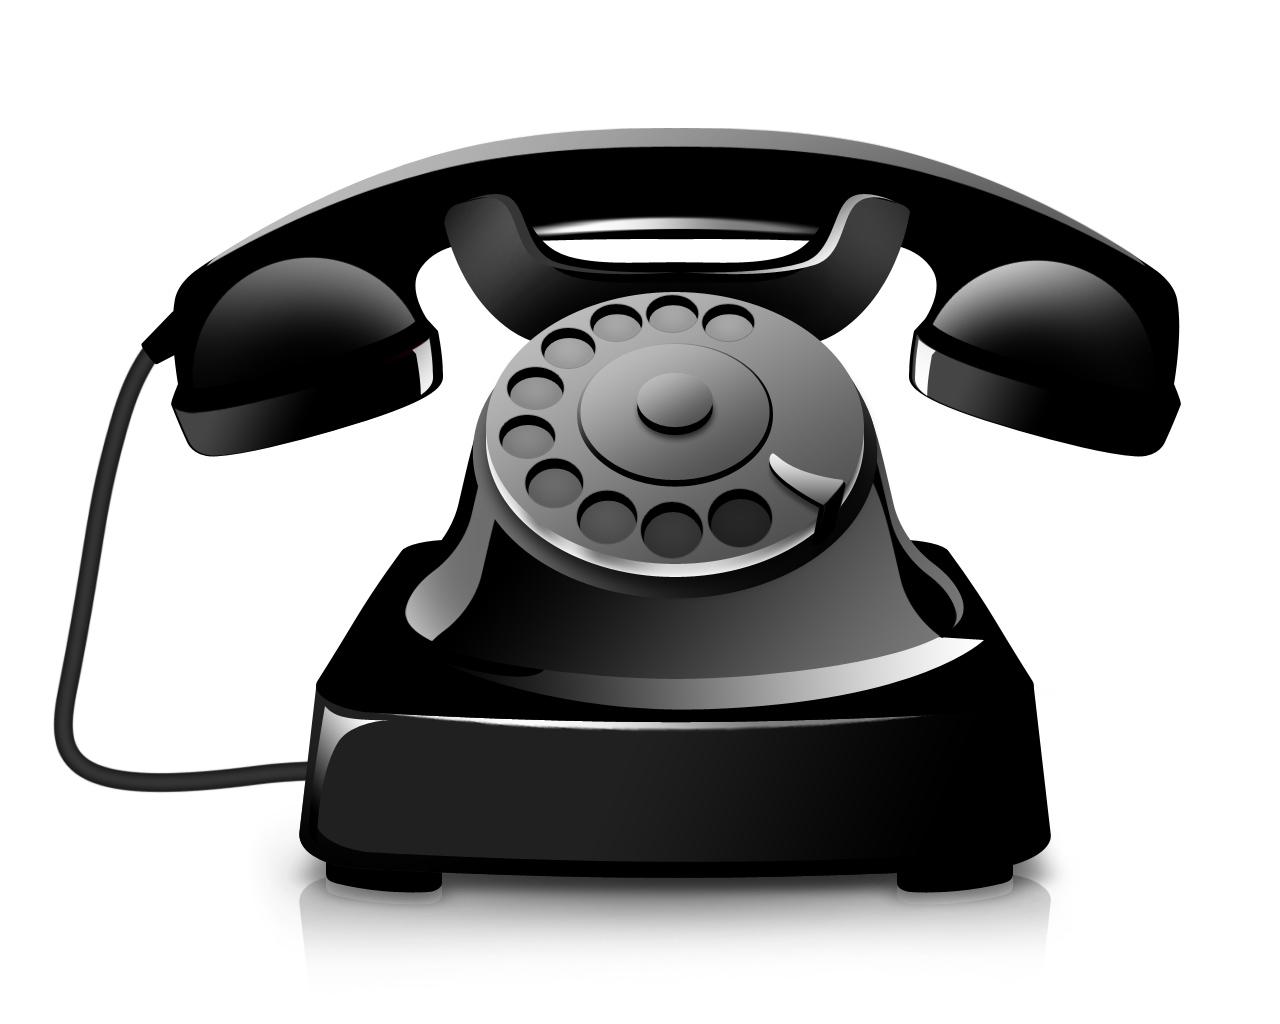 Phone clipart landline phone Telephone Clipart Landline Telephone Telephone